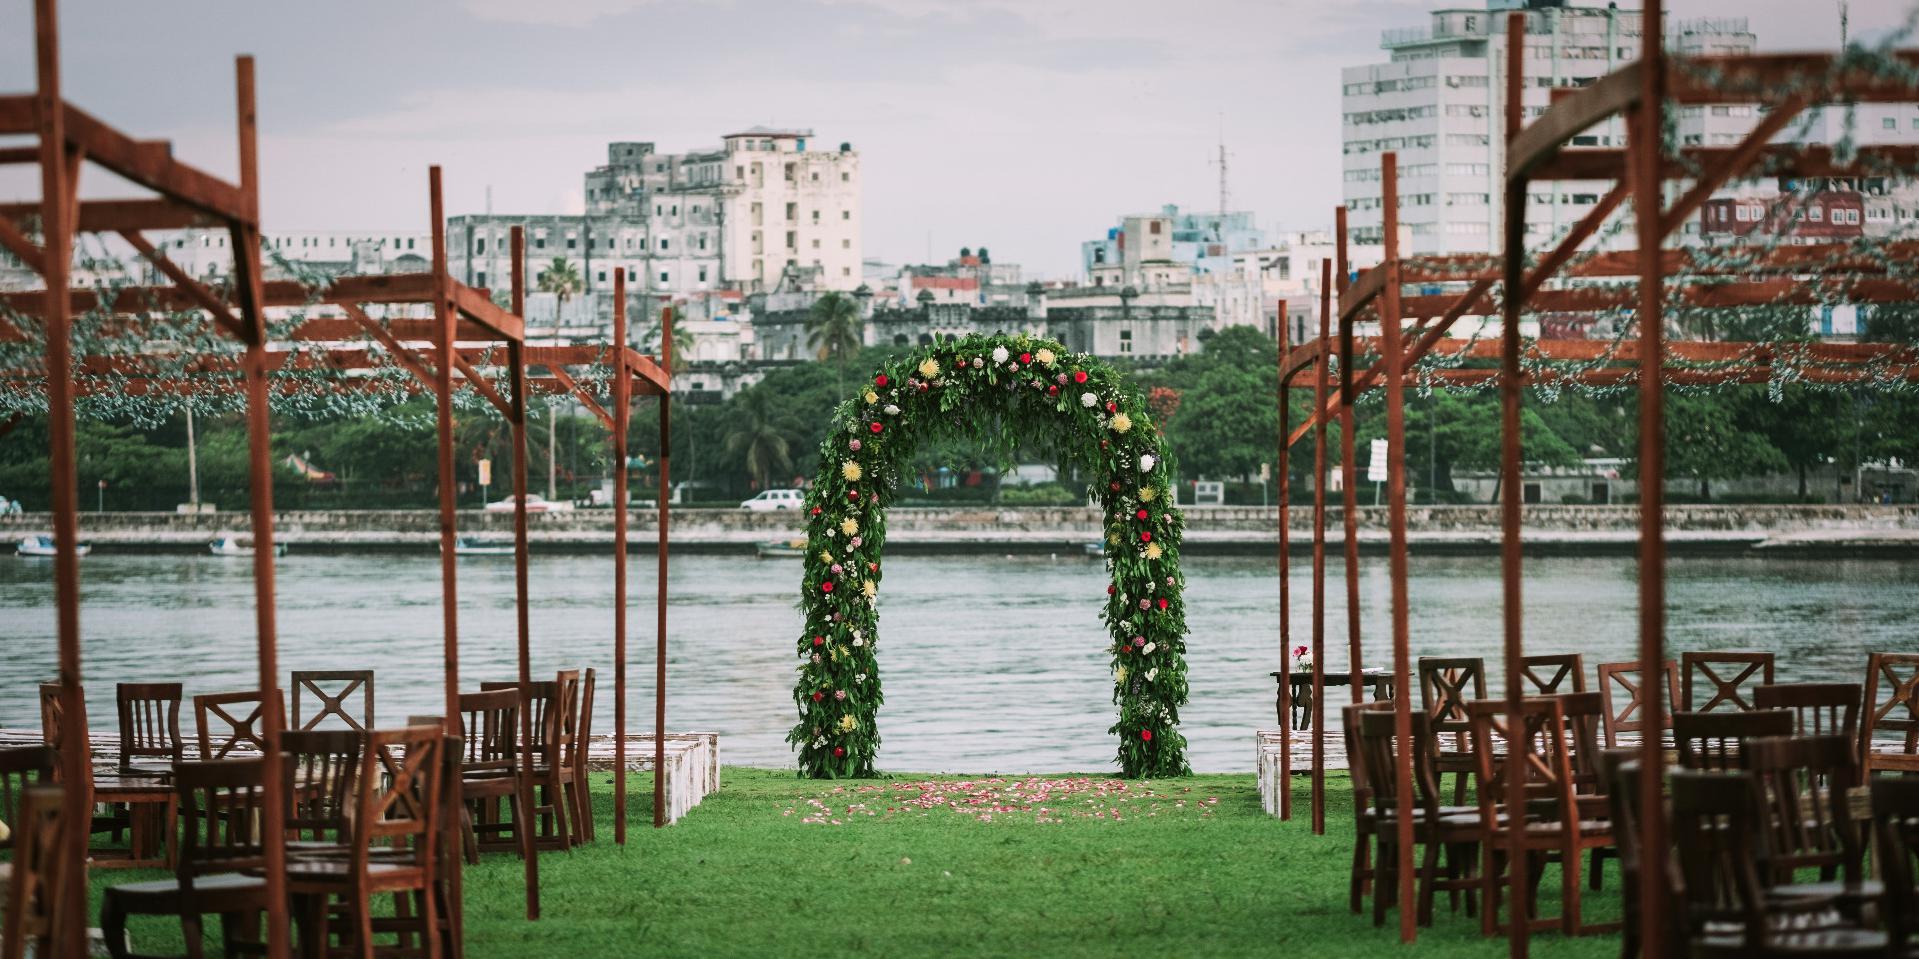 bodas-sin-clasificar-sin-tema-cuba-29221.jpg